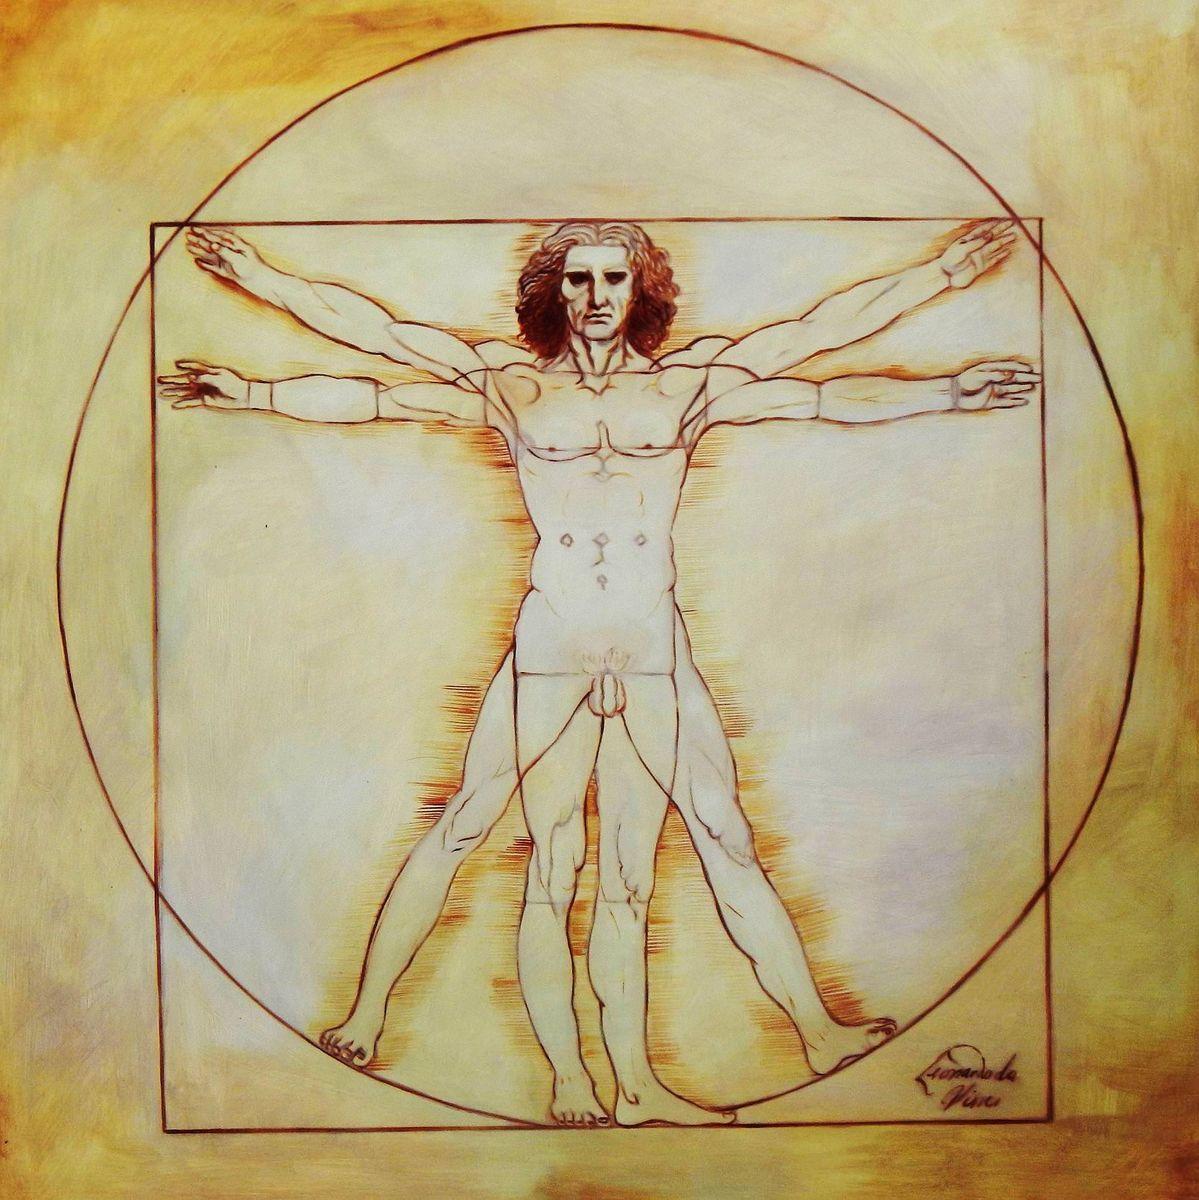 Leonardo da Vinci - Proportionsstudie h94024 90x90cm handgemaltes Ölgemälde